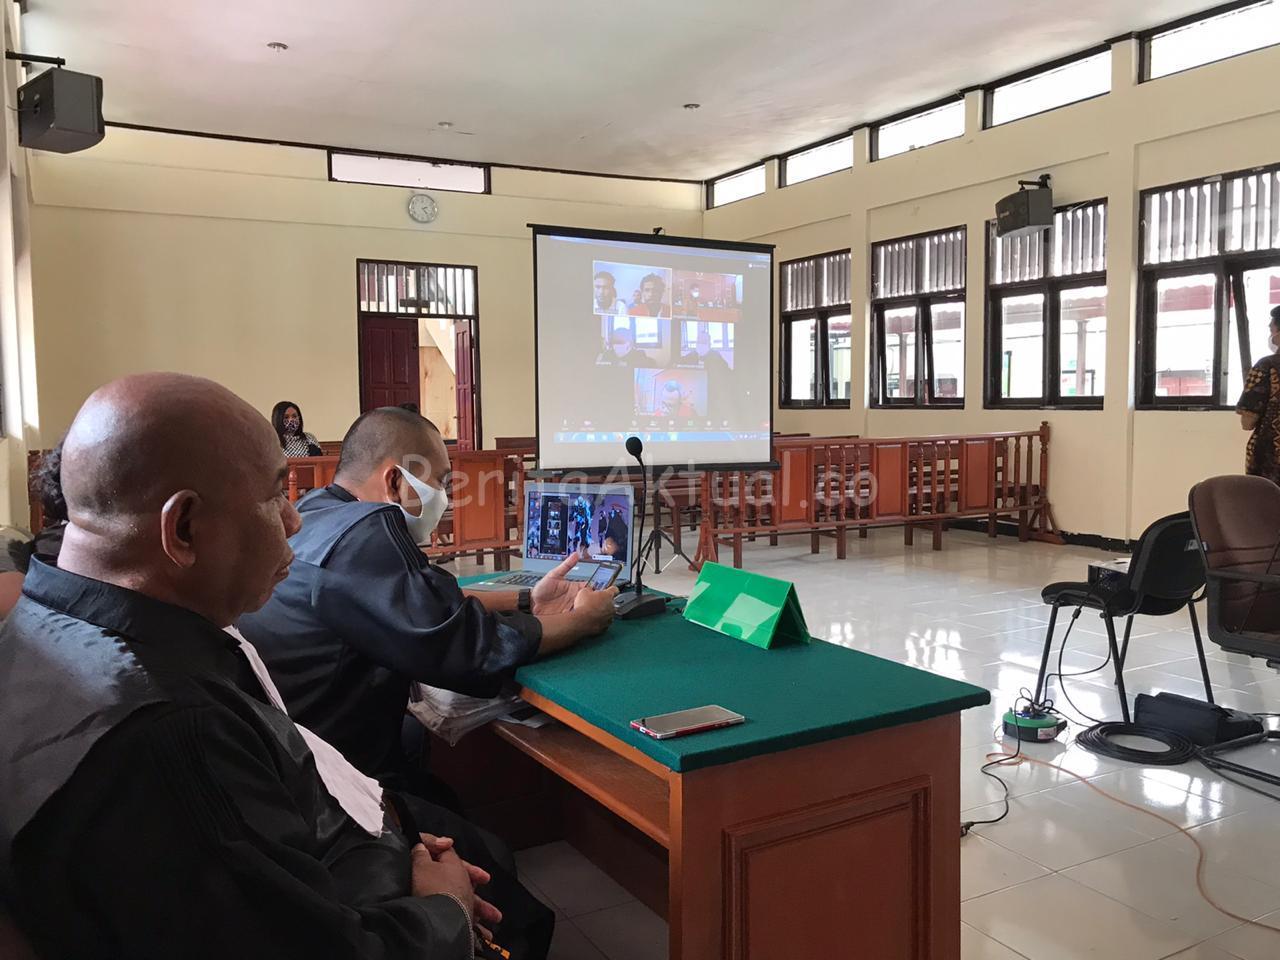 Terbukti Bersalah, 4 Terdakwa Makar di Sorong Divonis 8 Bulan 15 Hari 4 IMG 20200528 WA0131